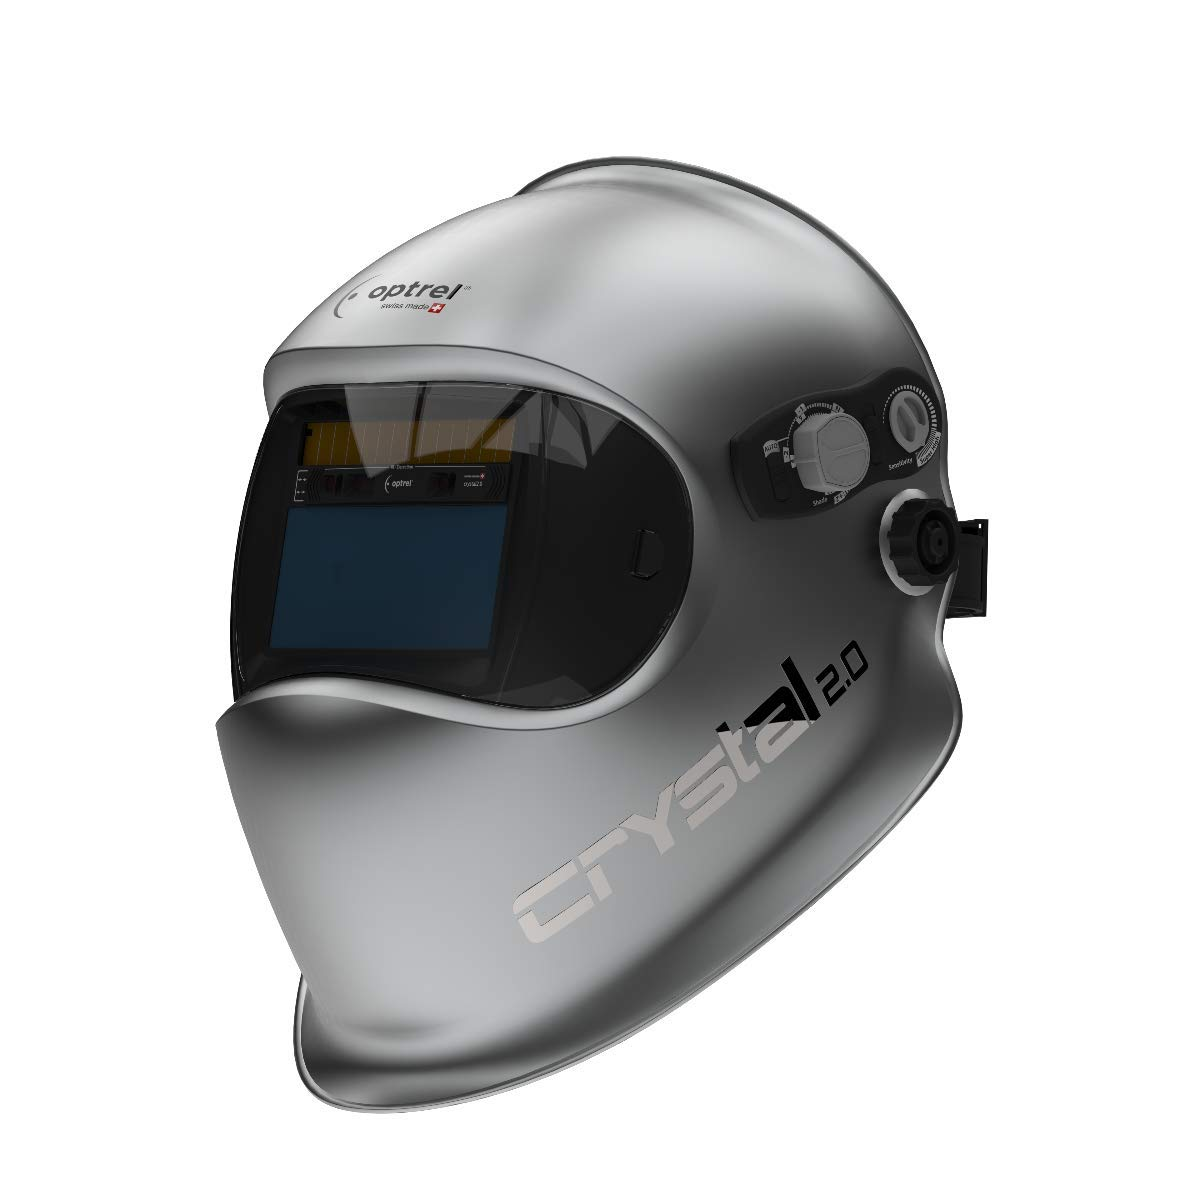 Optrel Crystal 2.0 Auto-Darkening Welding Helmet 1006.900 by Optrel (Image #4)